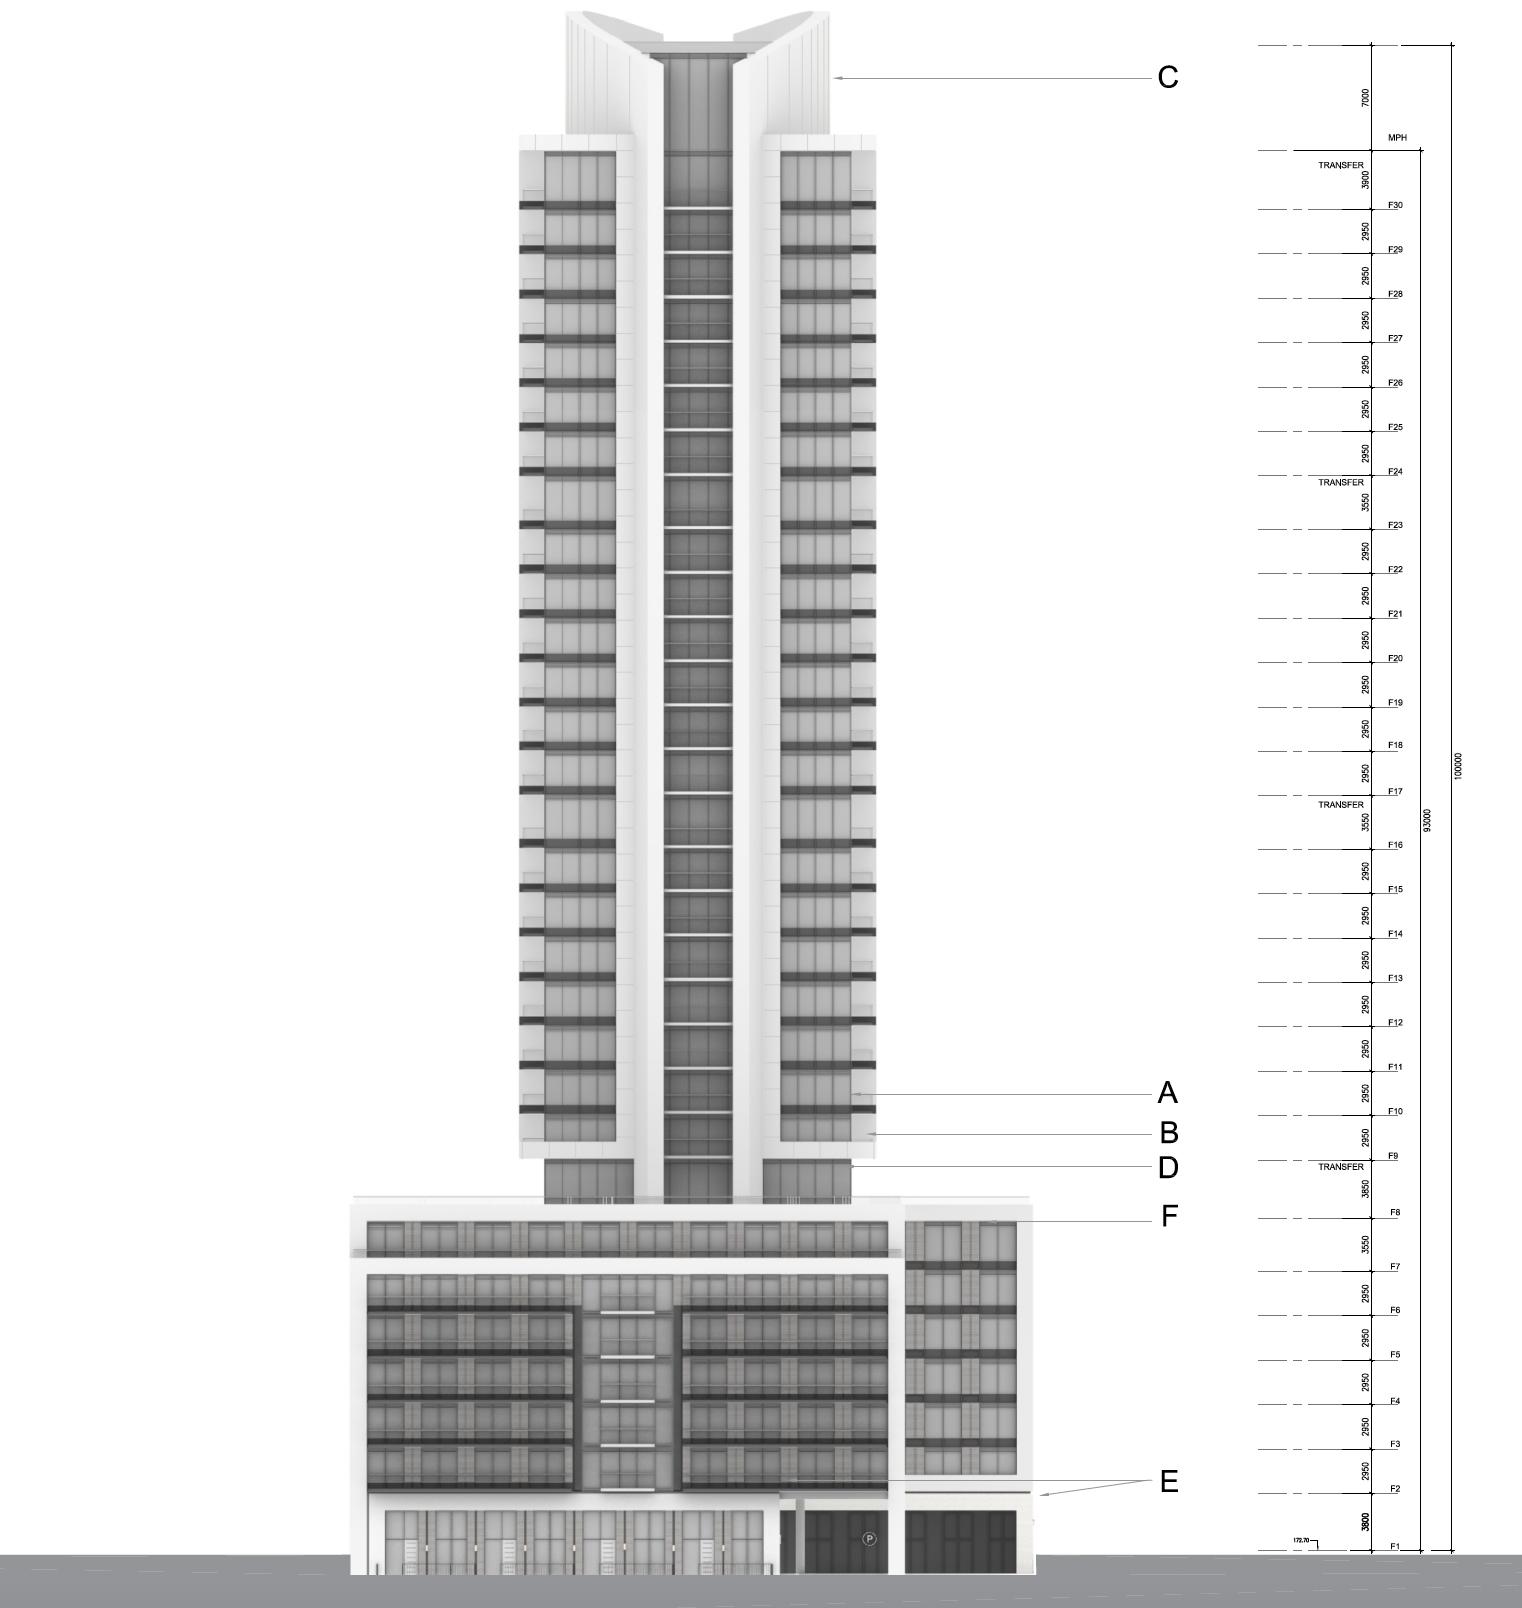 1812 Eglington Avenue W, Toronto, designed by IBI Group for DMJ Eglinton Development Corporation